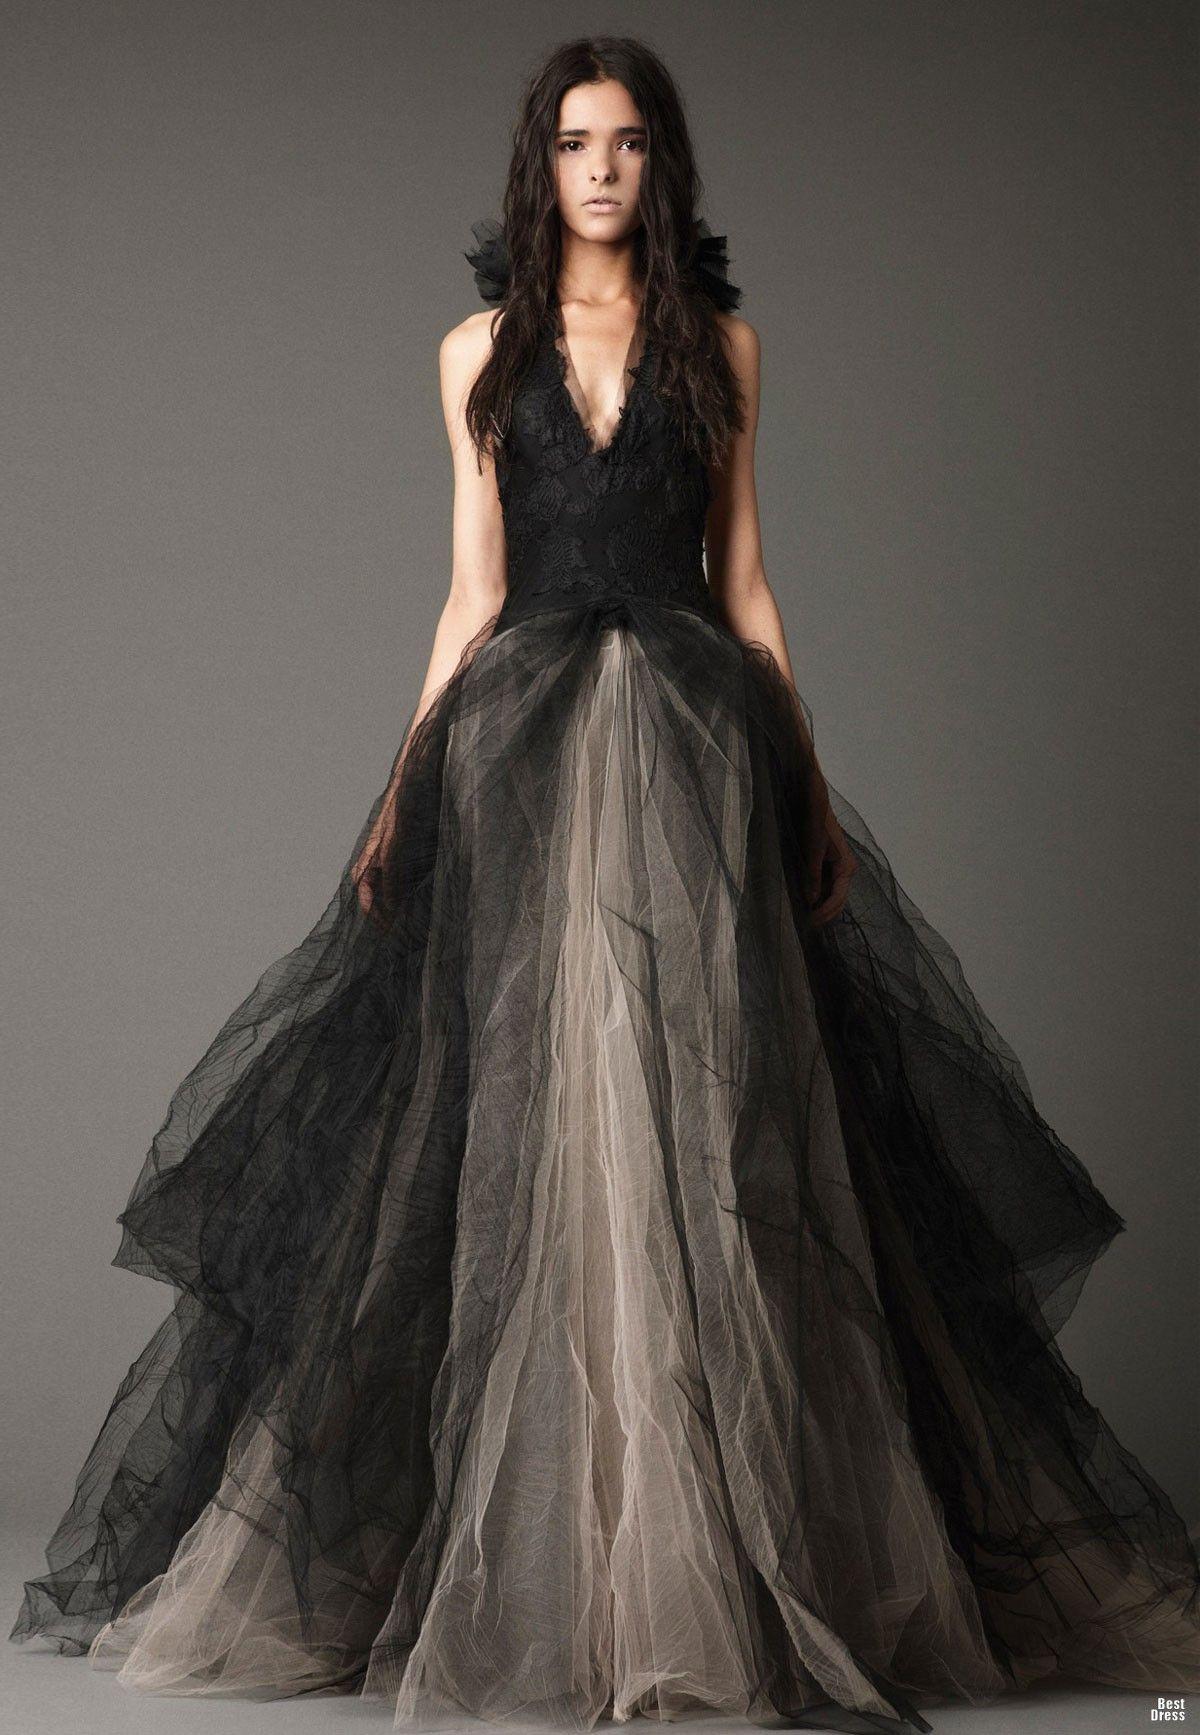 Vera Wang 2012 2013 Bestdress Cajt O Platyah Black Wedding Dresses Wedding Dresses Vera Wang Beautiful Dresses